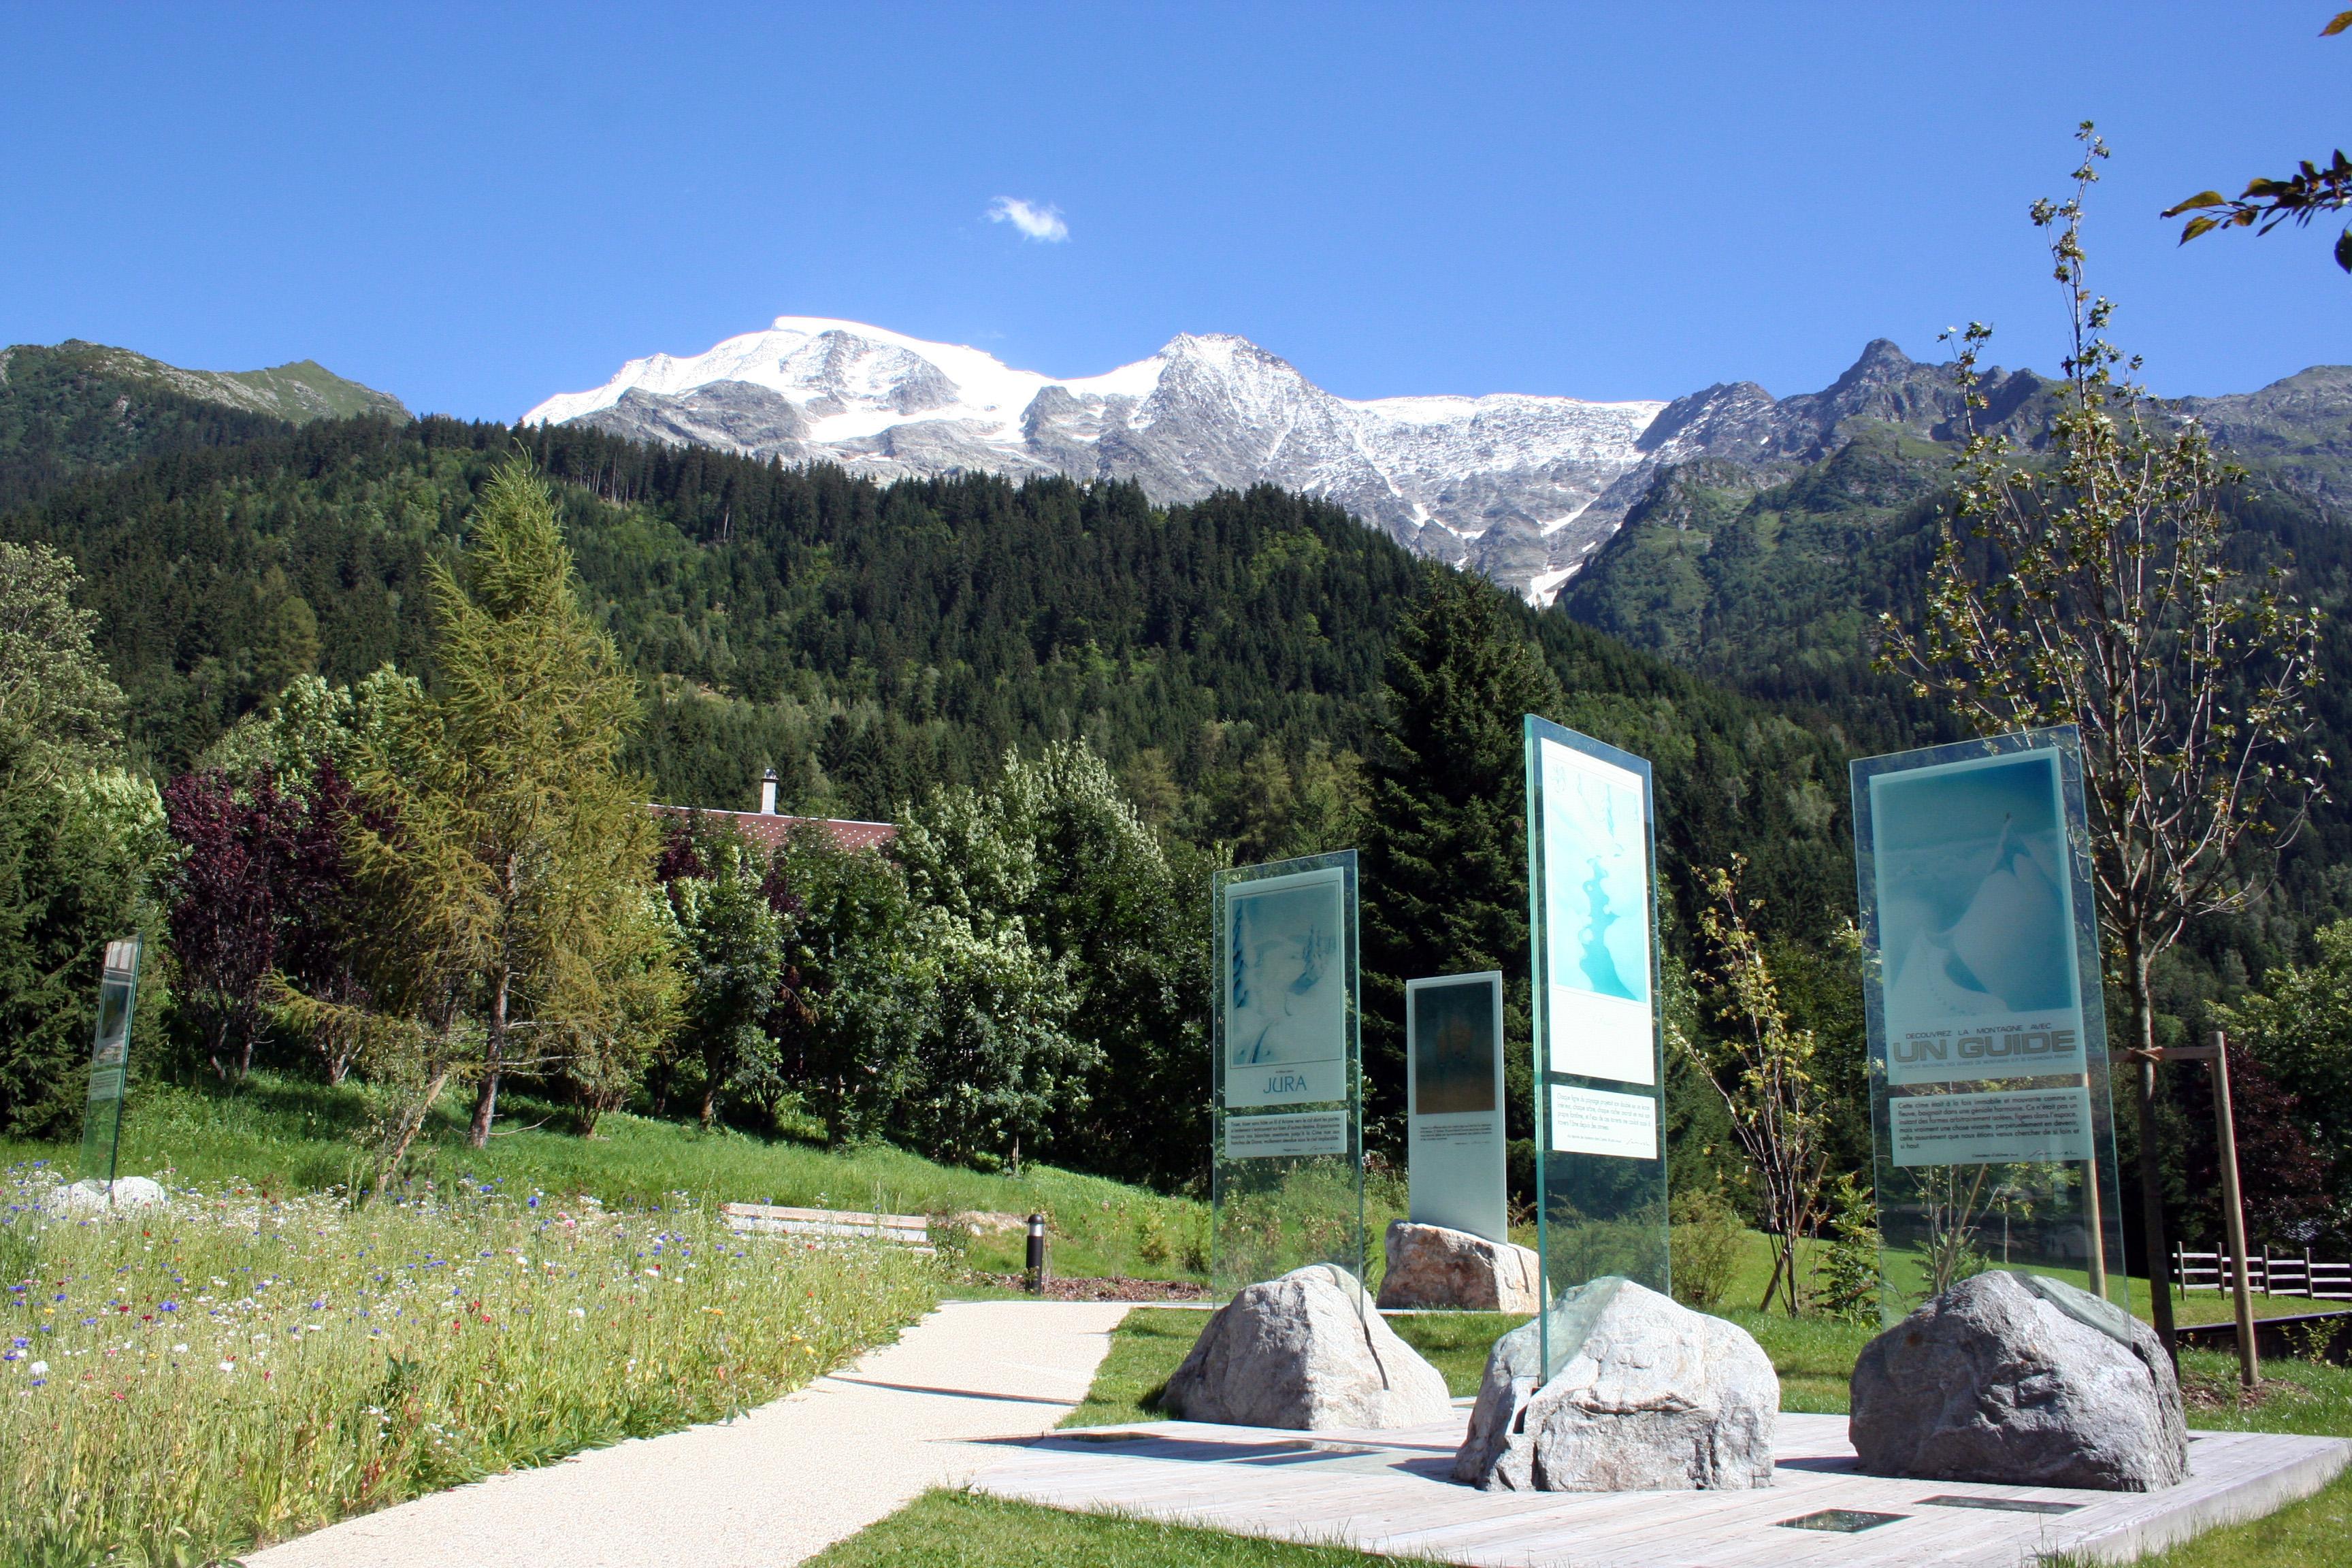 Jardin samivel savoie mont blanc savoie et haute savoie alpes for Cloture de jardin haute savoie